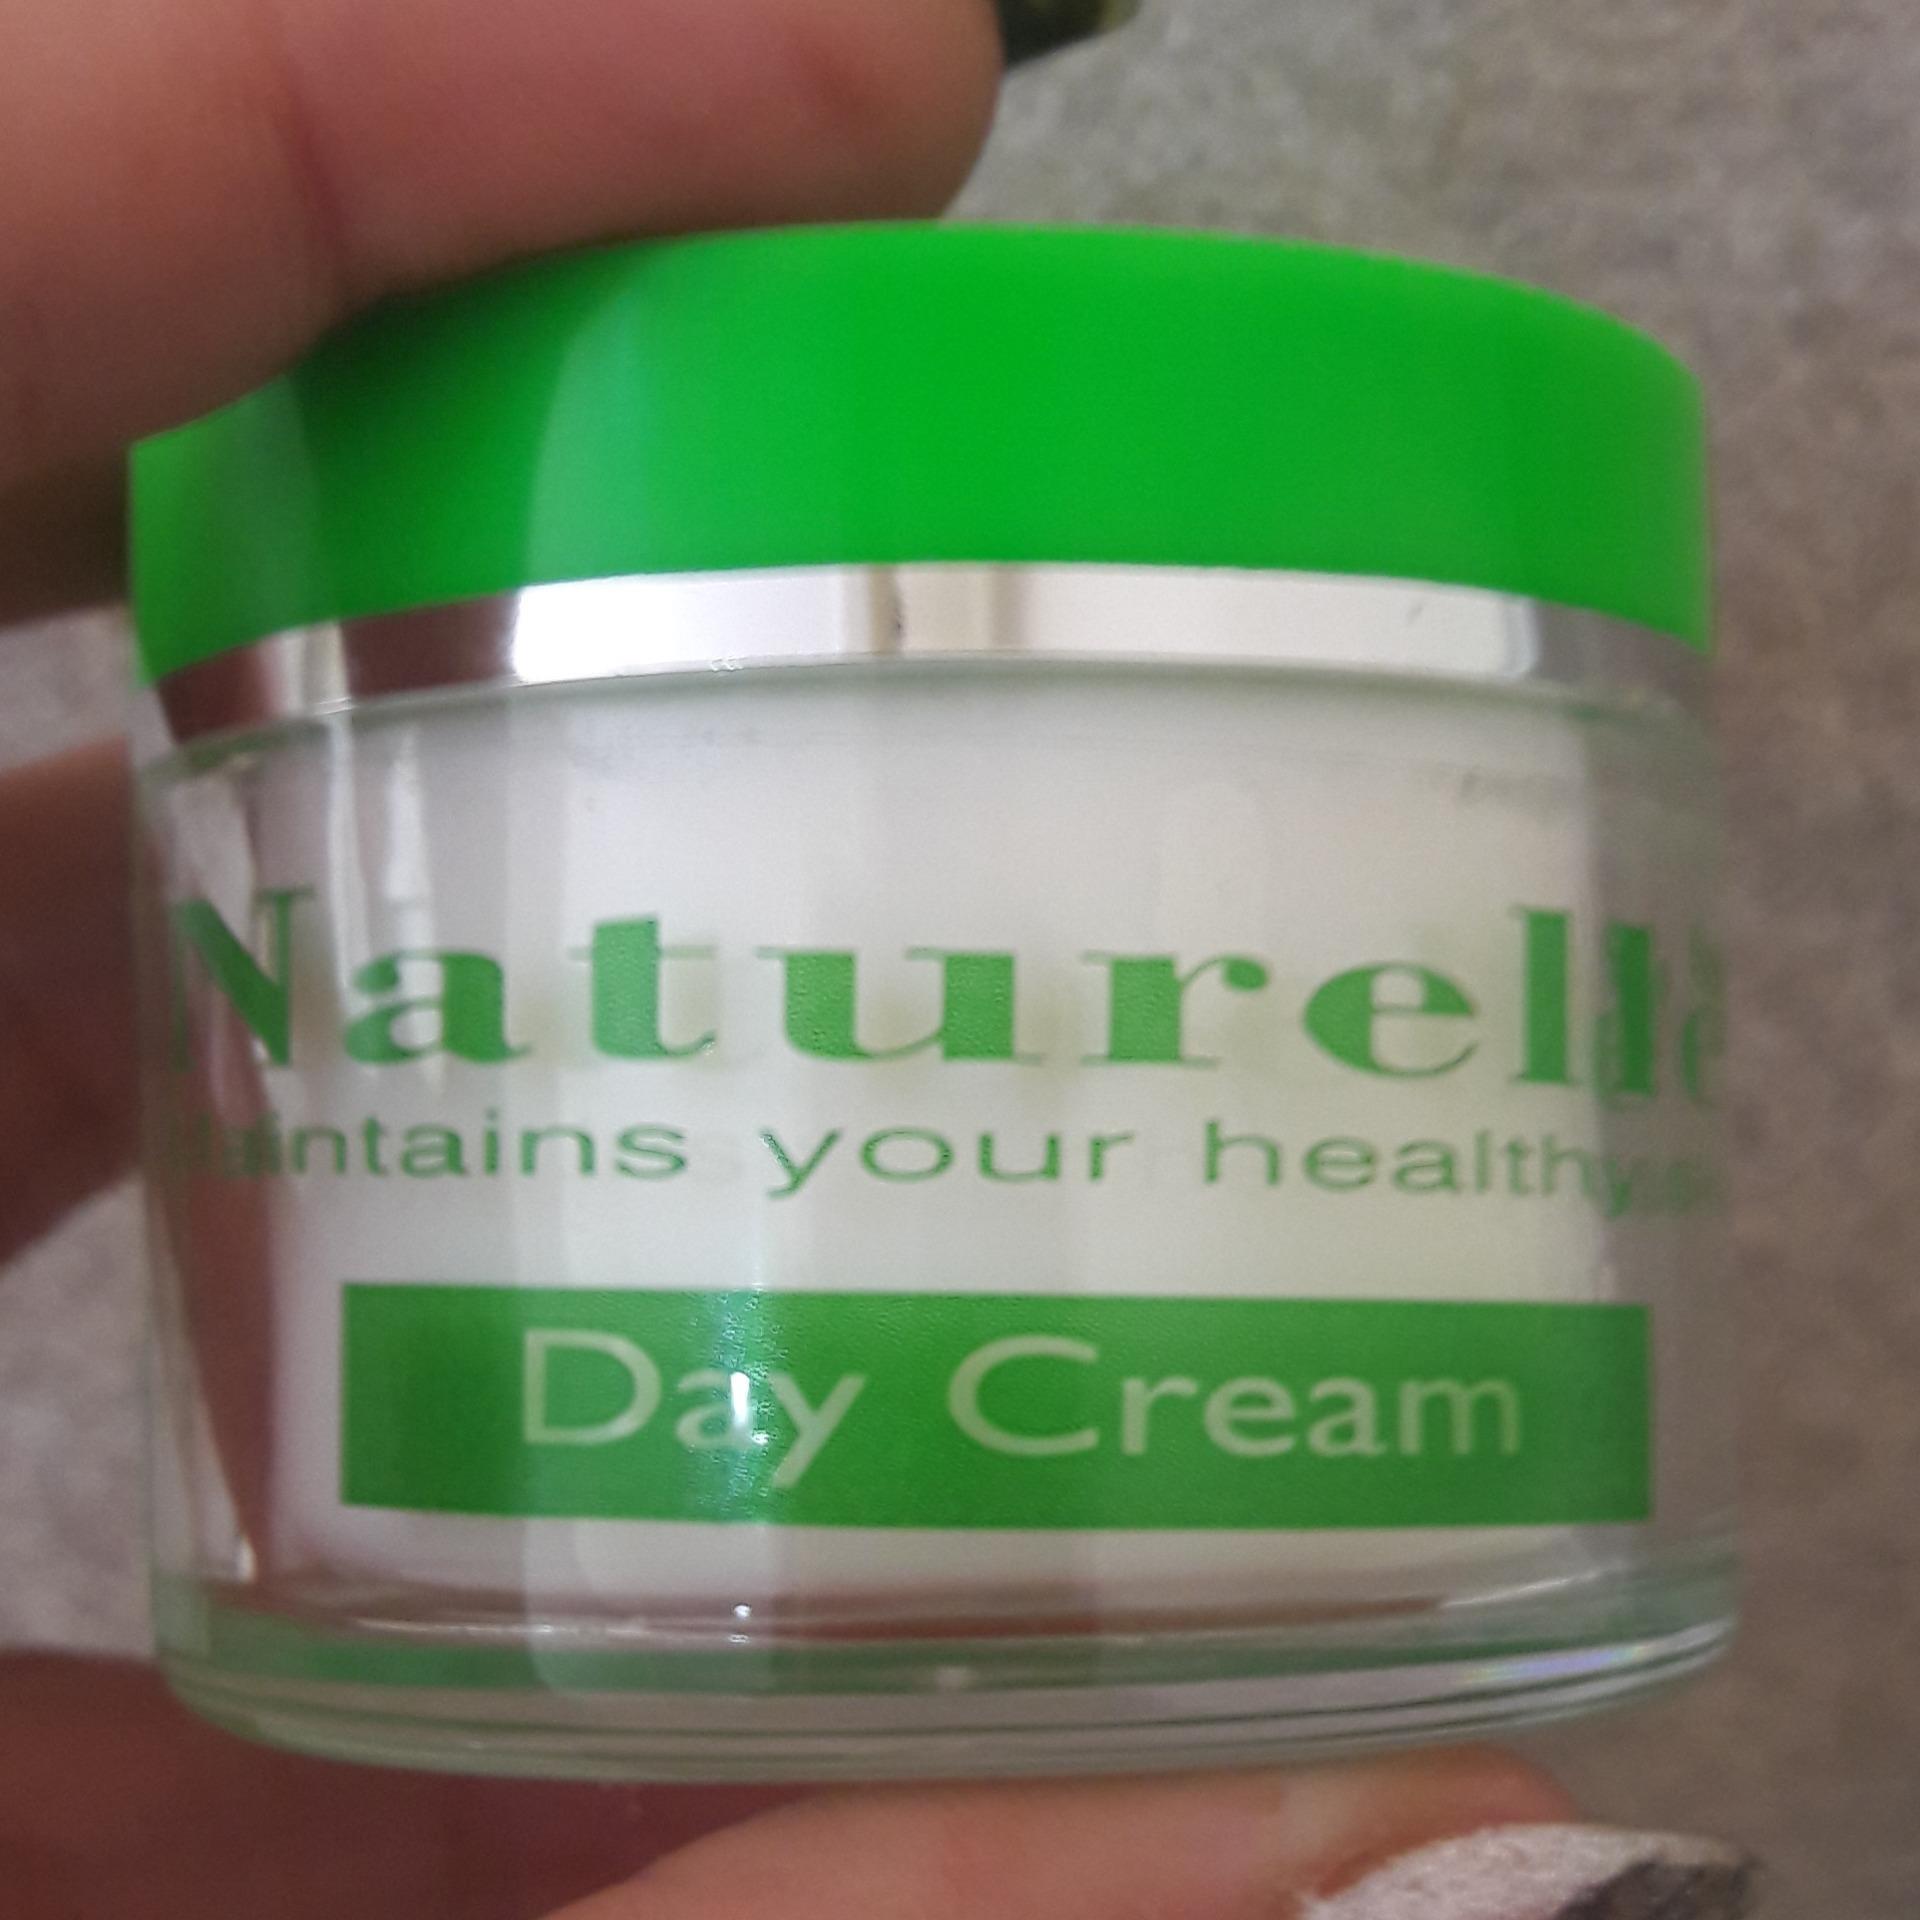 Drskin Care Cream Cr Biru Tas Daftar Harga Terbaru Terlengkap Tile Paket Hn Theraskin Naturelle Skin